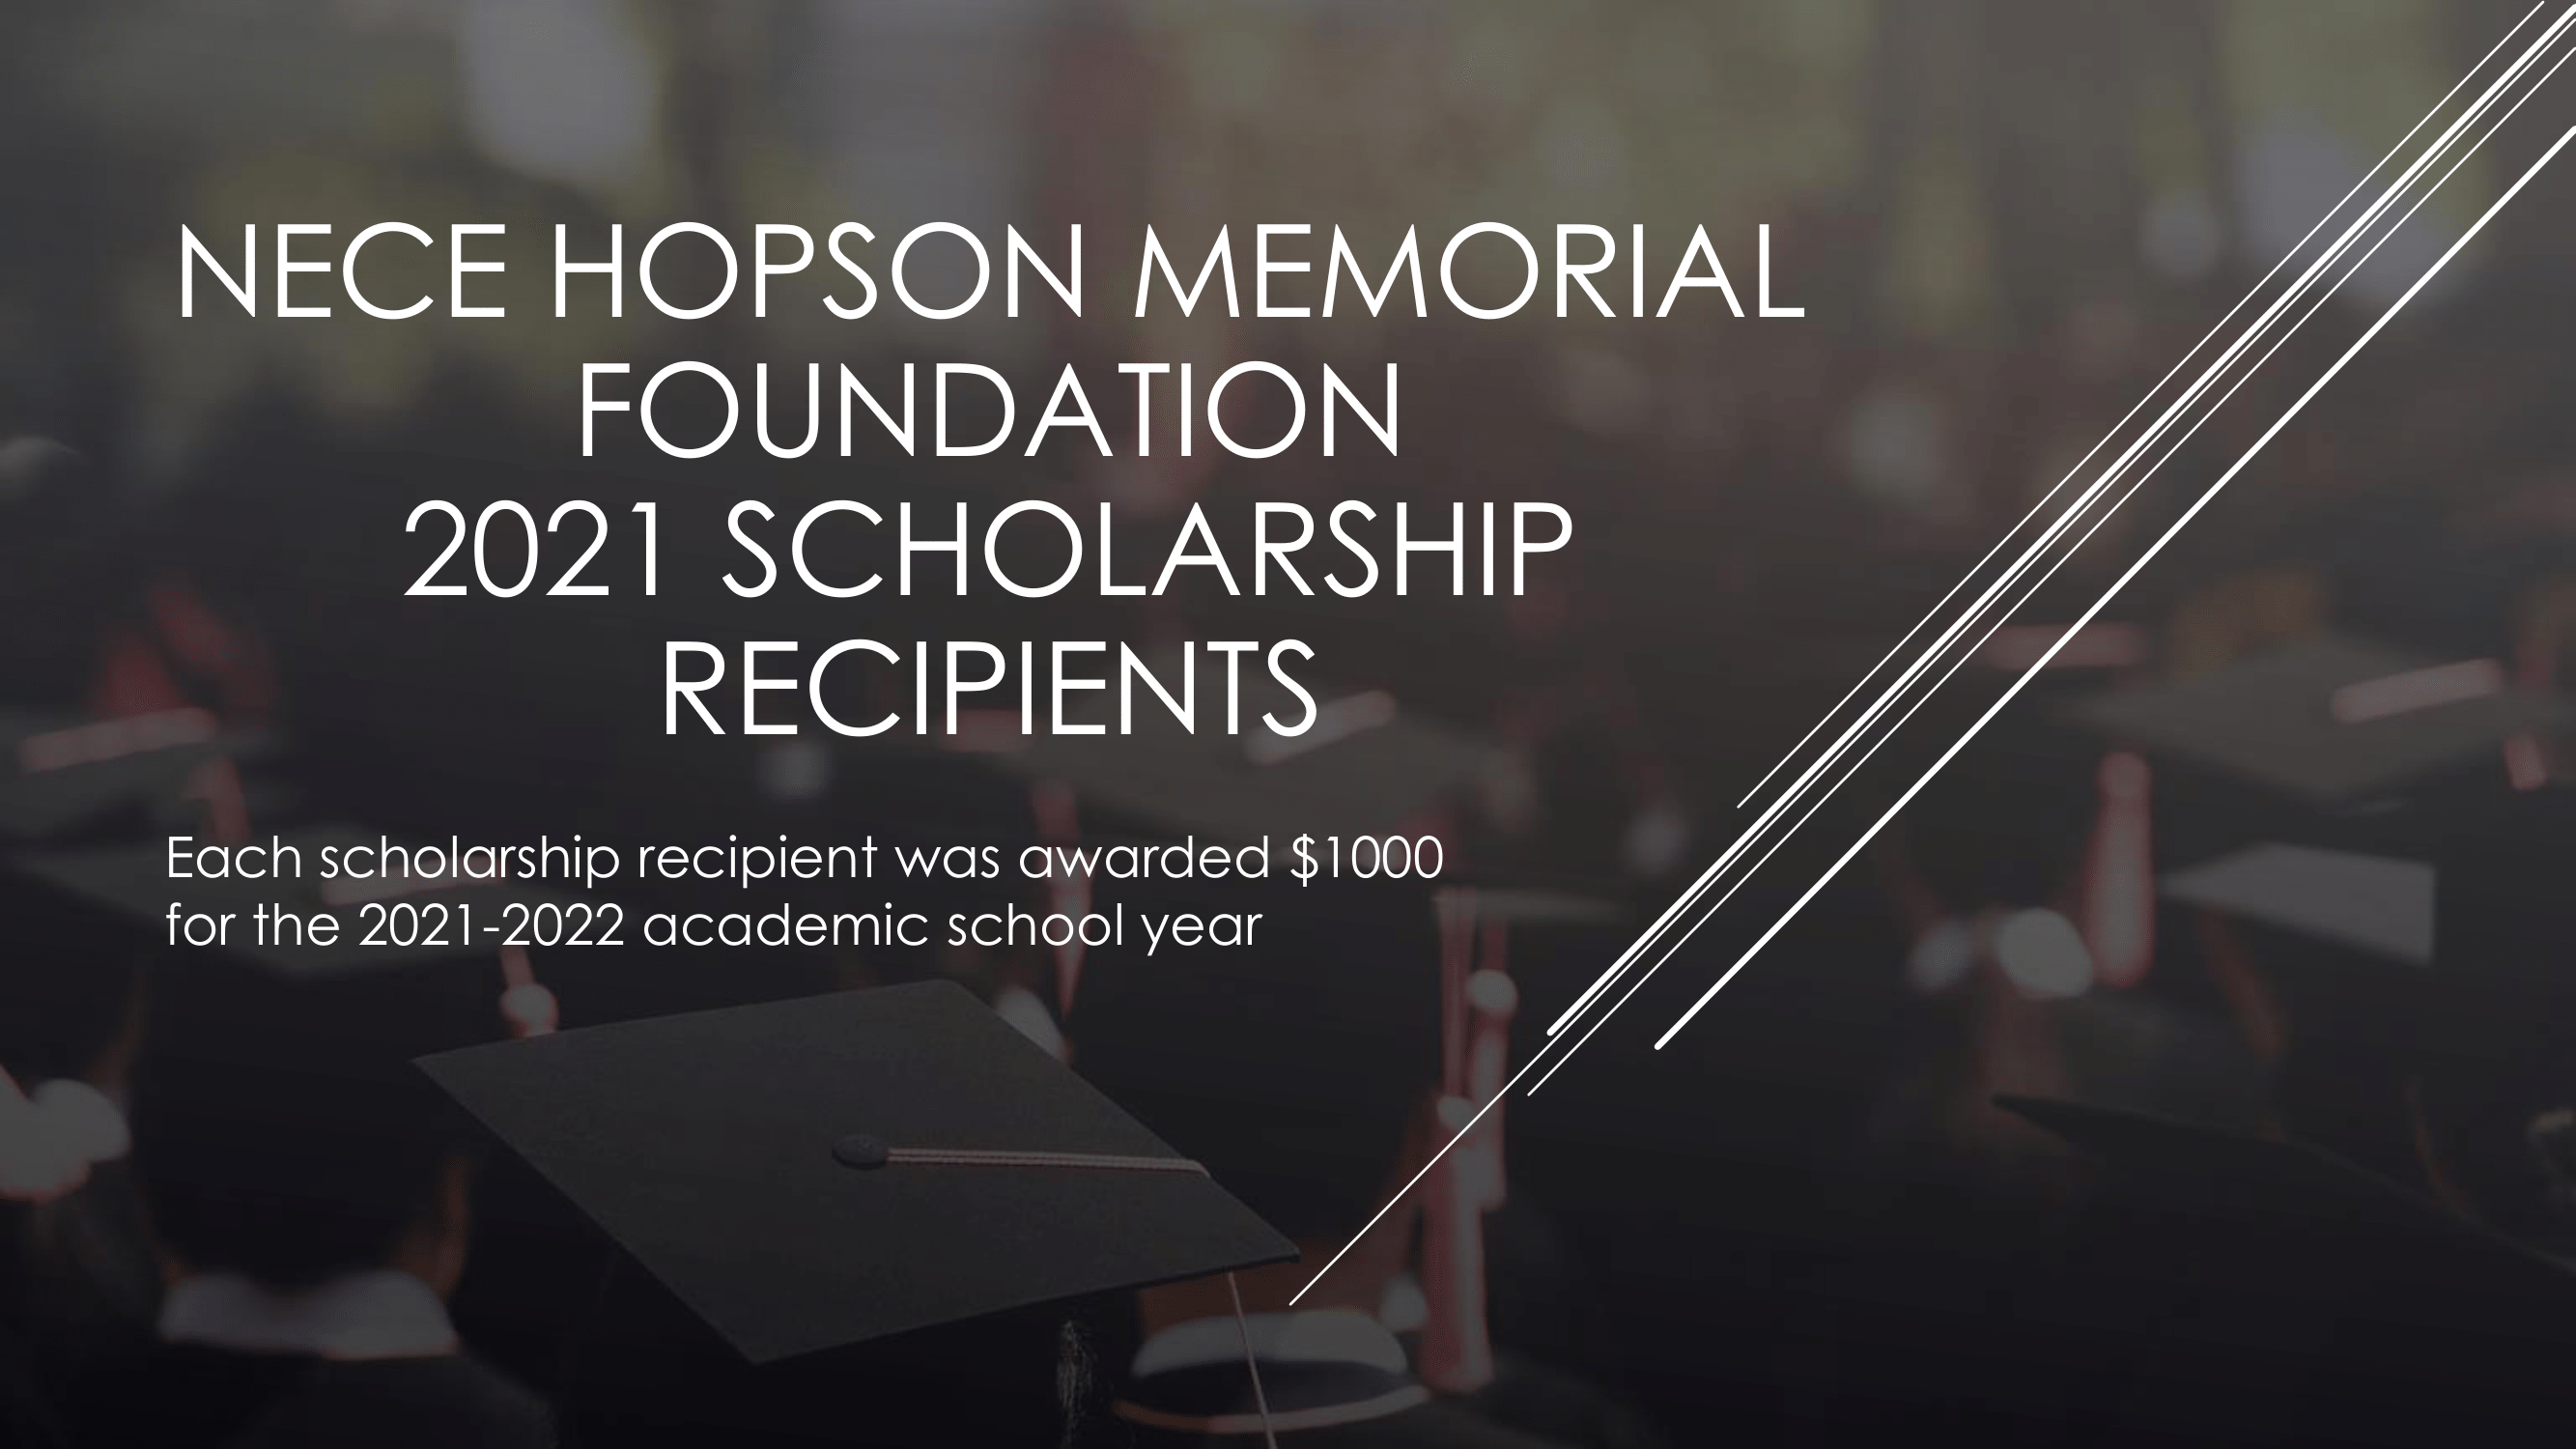 Nece Hopson Memorial Foundation  (NHMF) scholarships 2021 titlecard